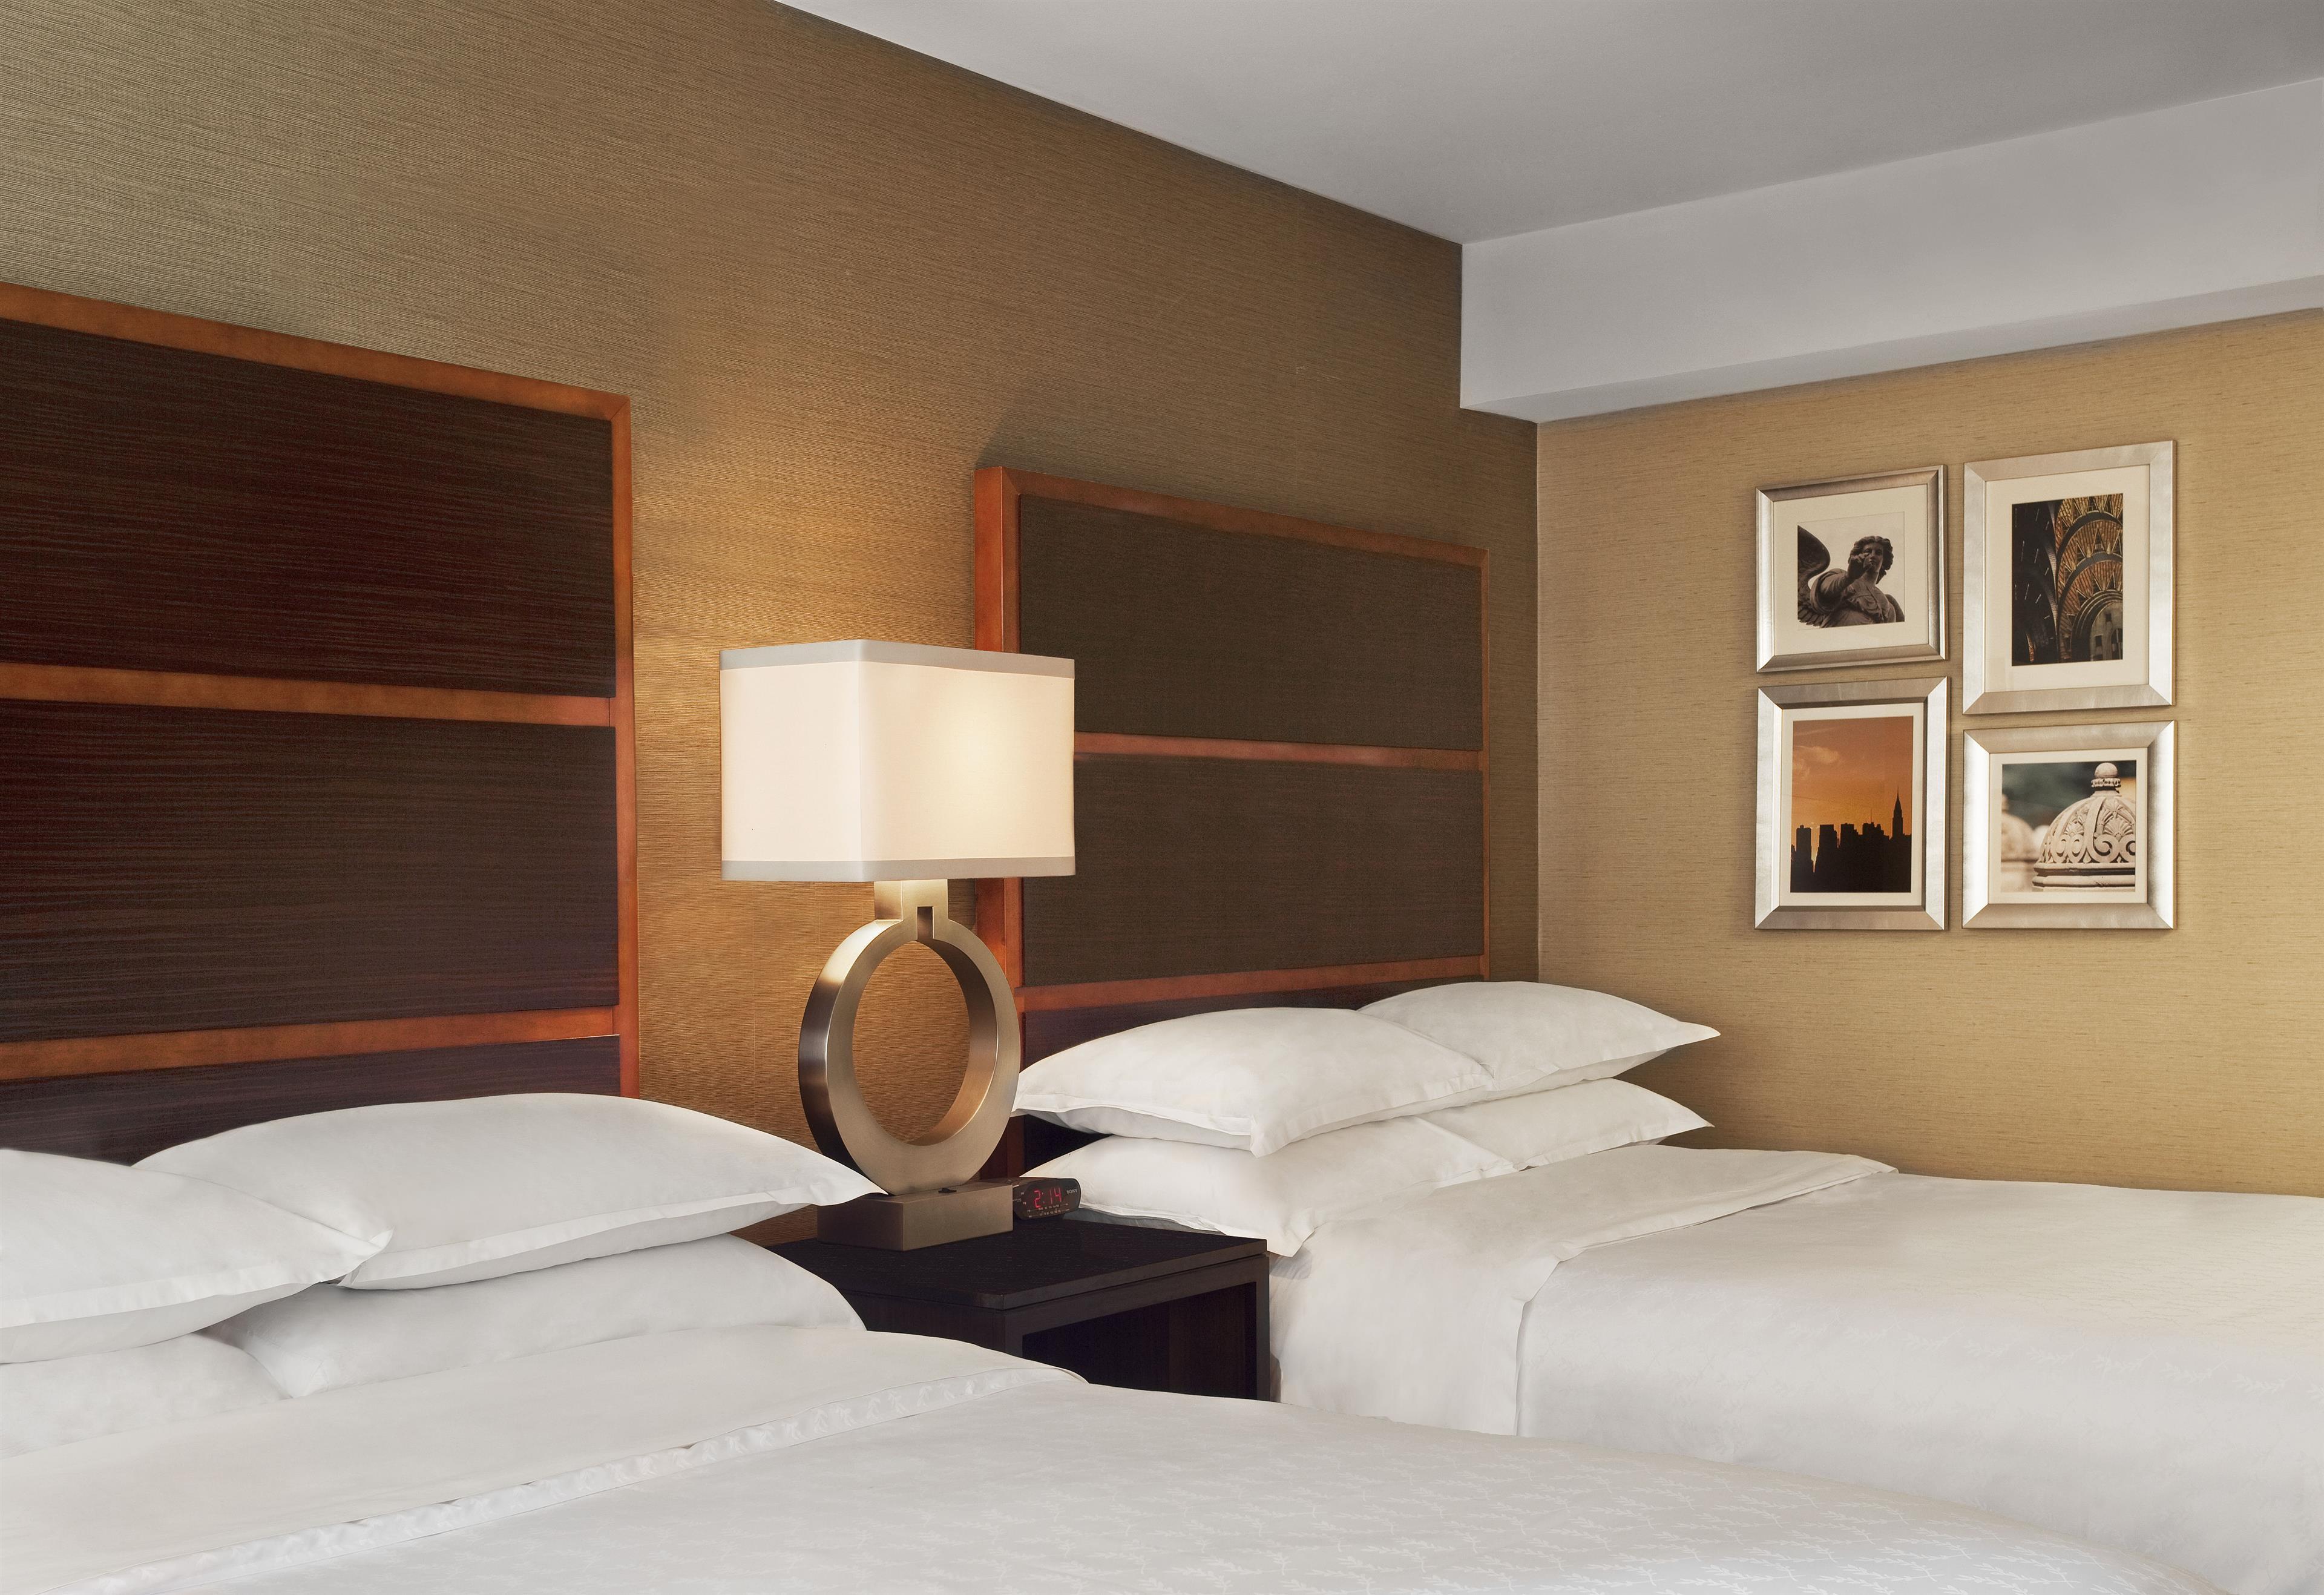 Sheraton New York Times Square Hotel image 9